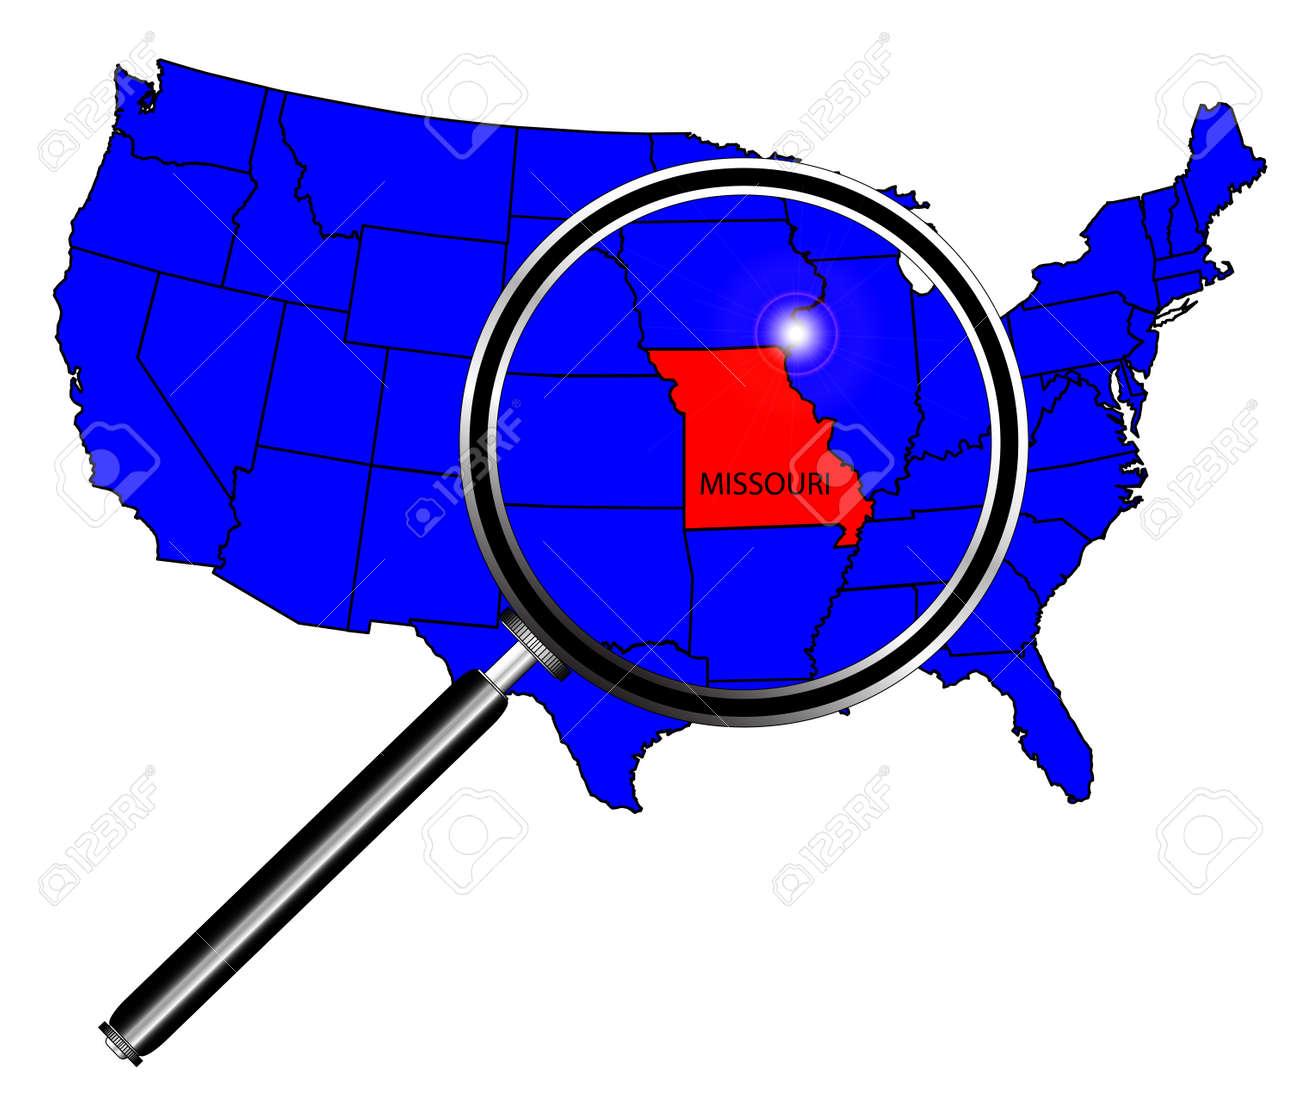 Missouri Map Missouri State Outline Easy Line Graphs - Missouri map of us